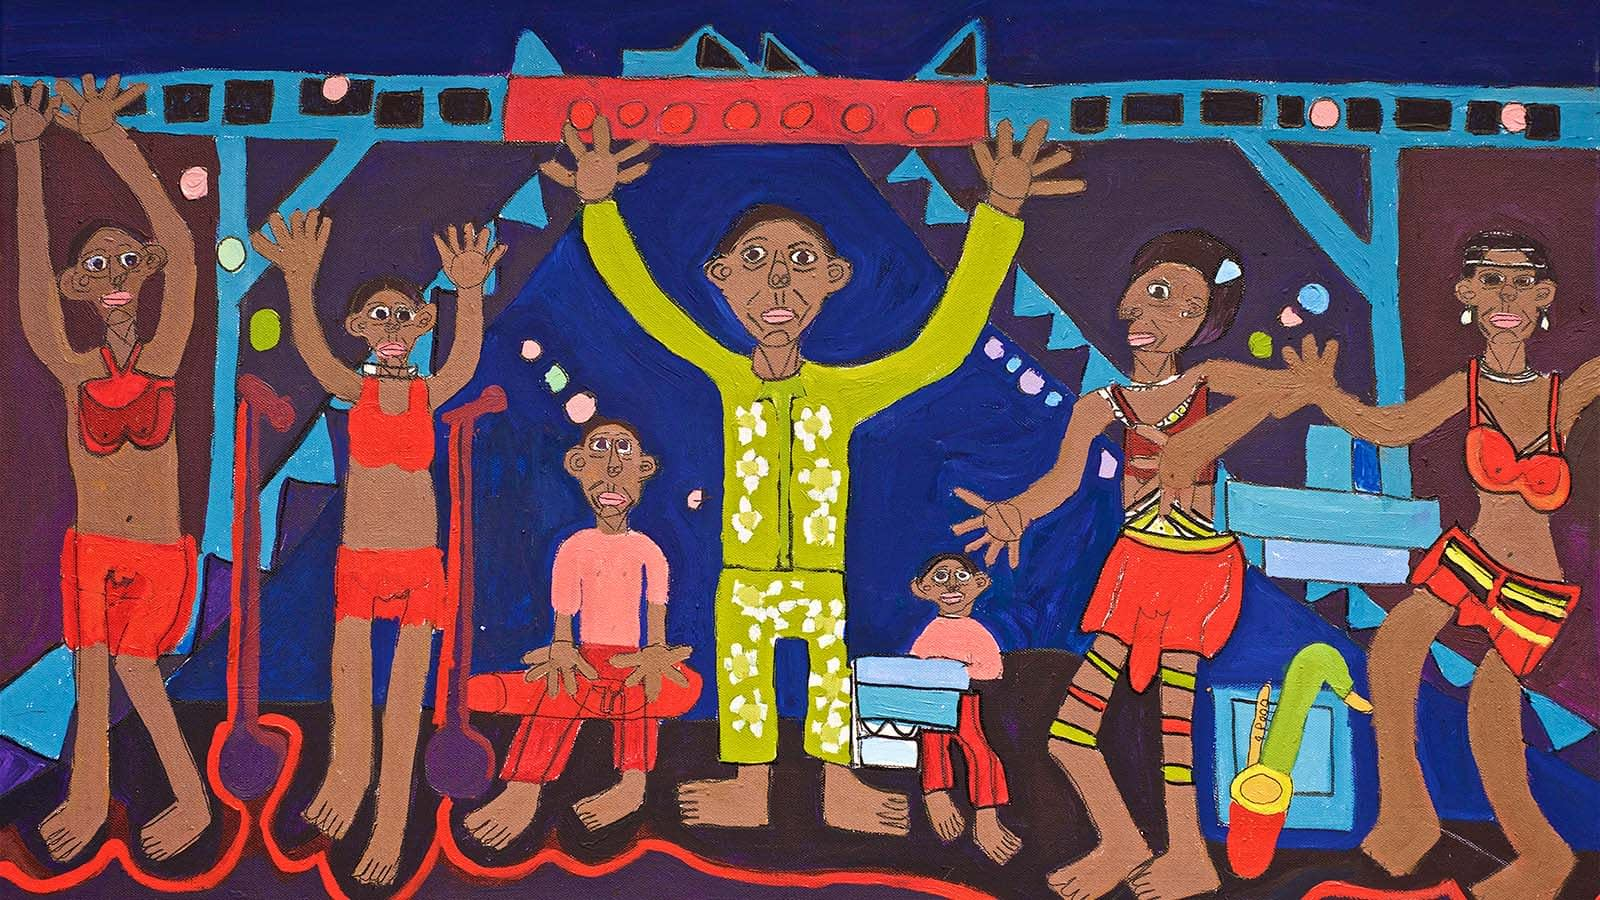 Fela Kuti Show Zion Levy Stewart Copyright 2018